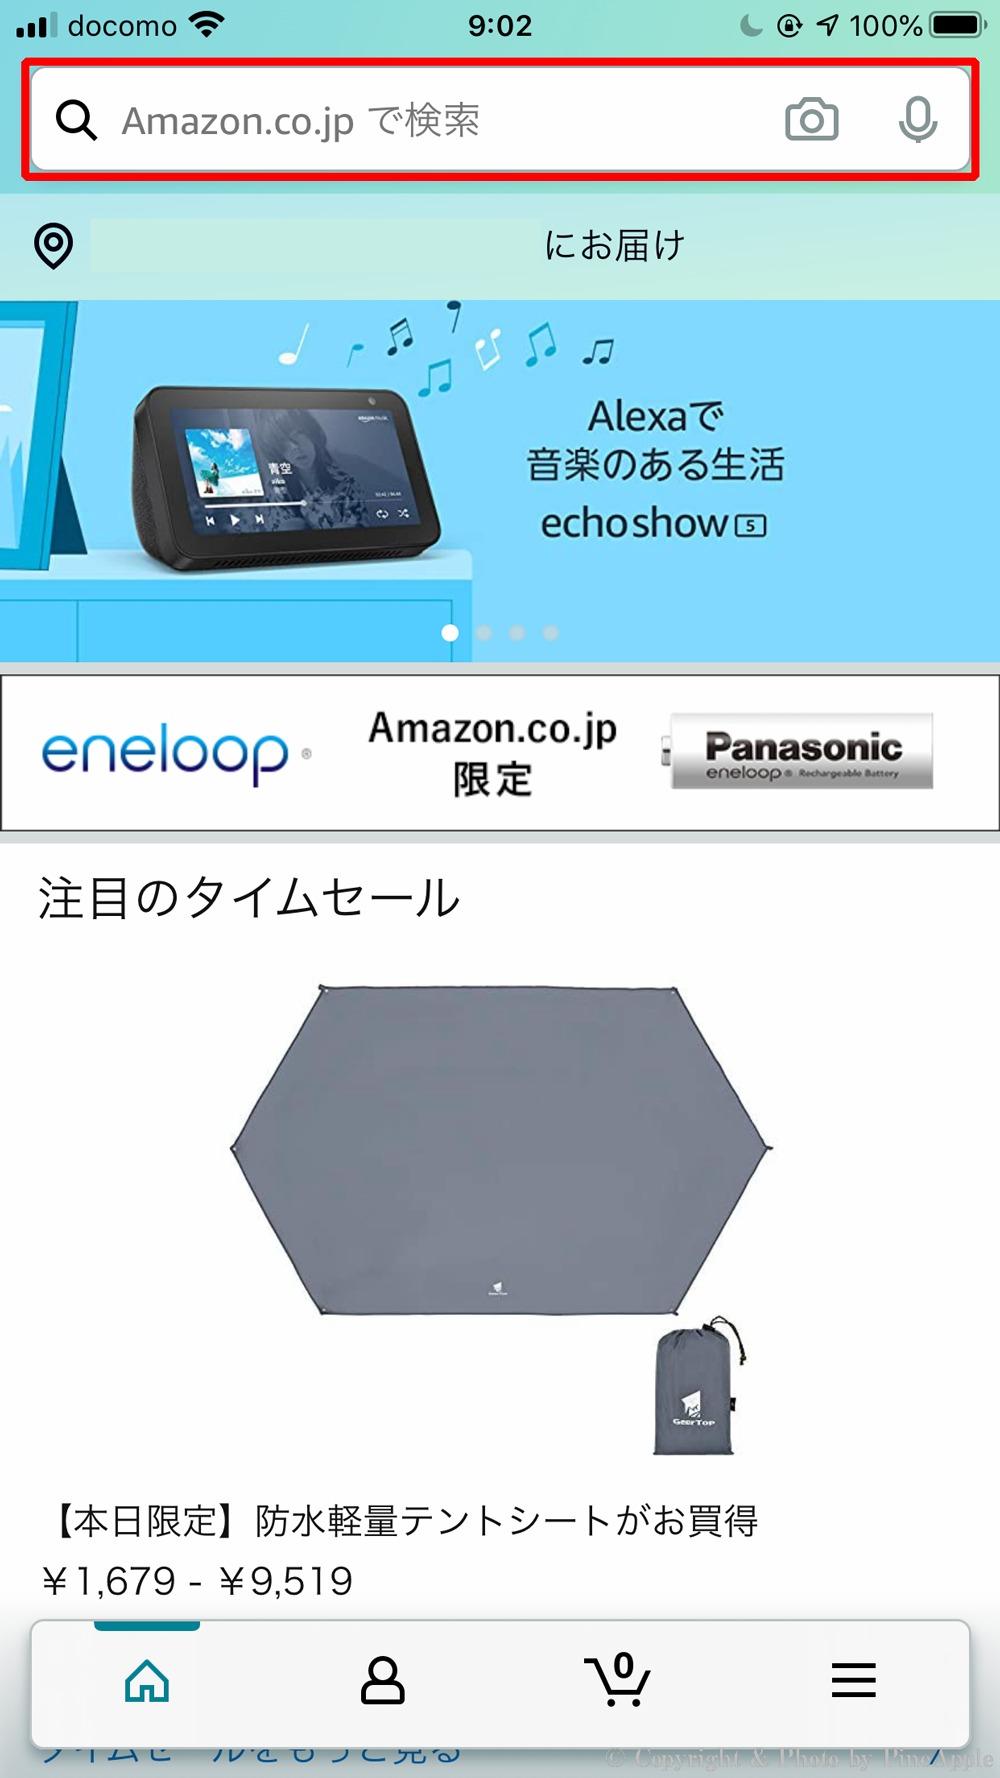 Amazon ショッピングアプリ:上部の「Amazon.co.jp で検索」をタップ